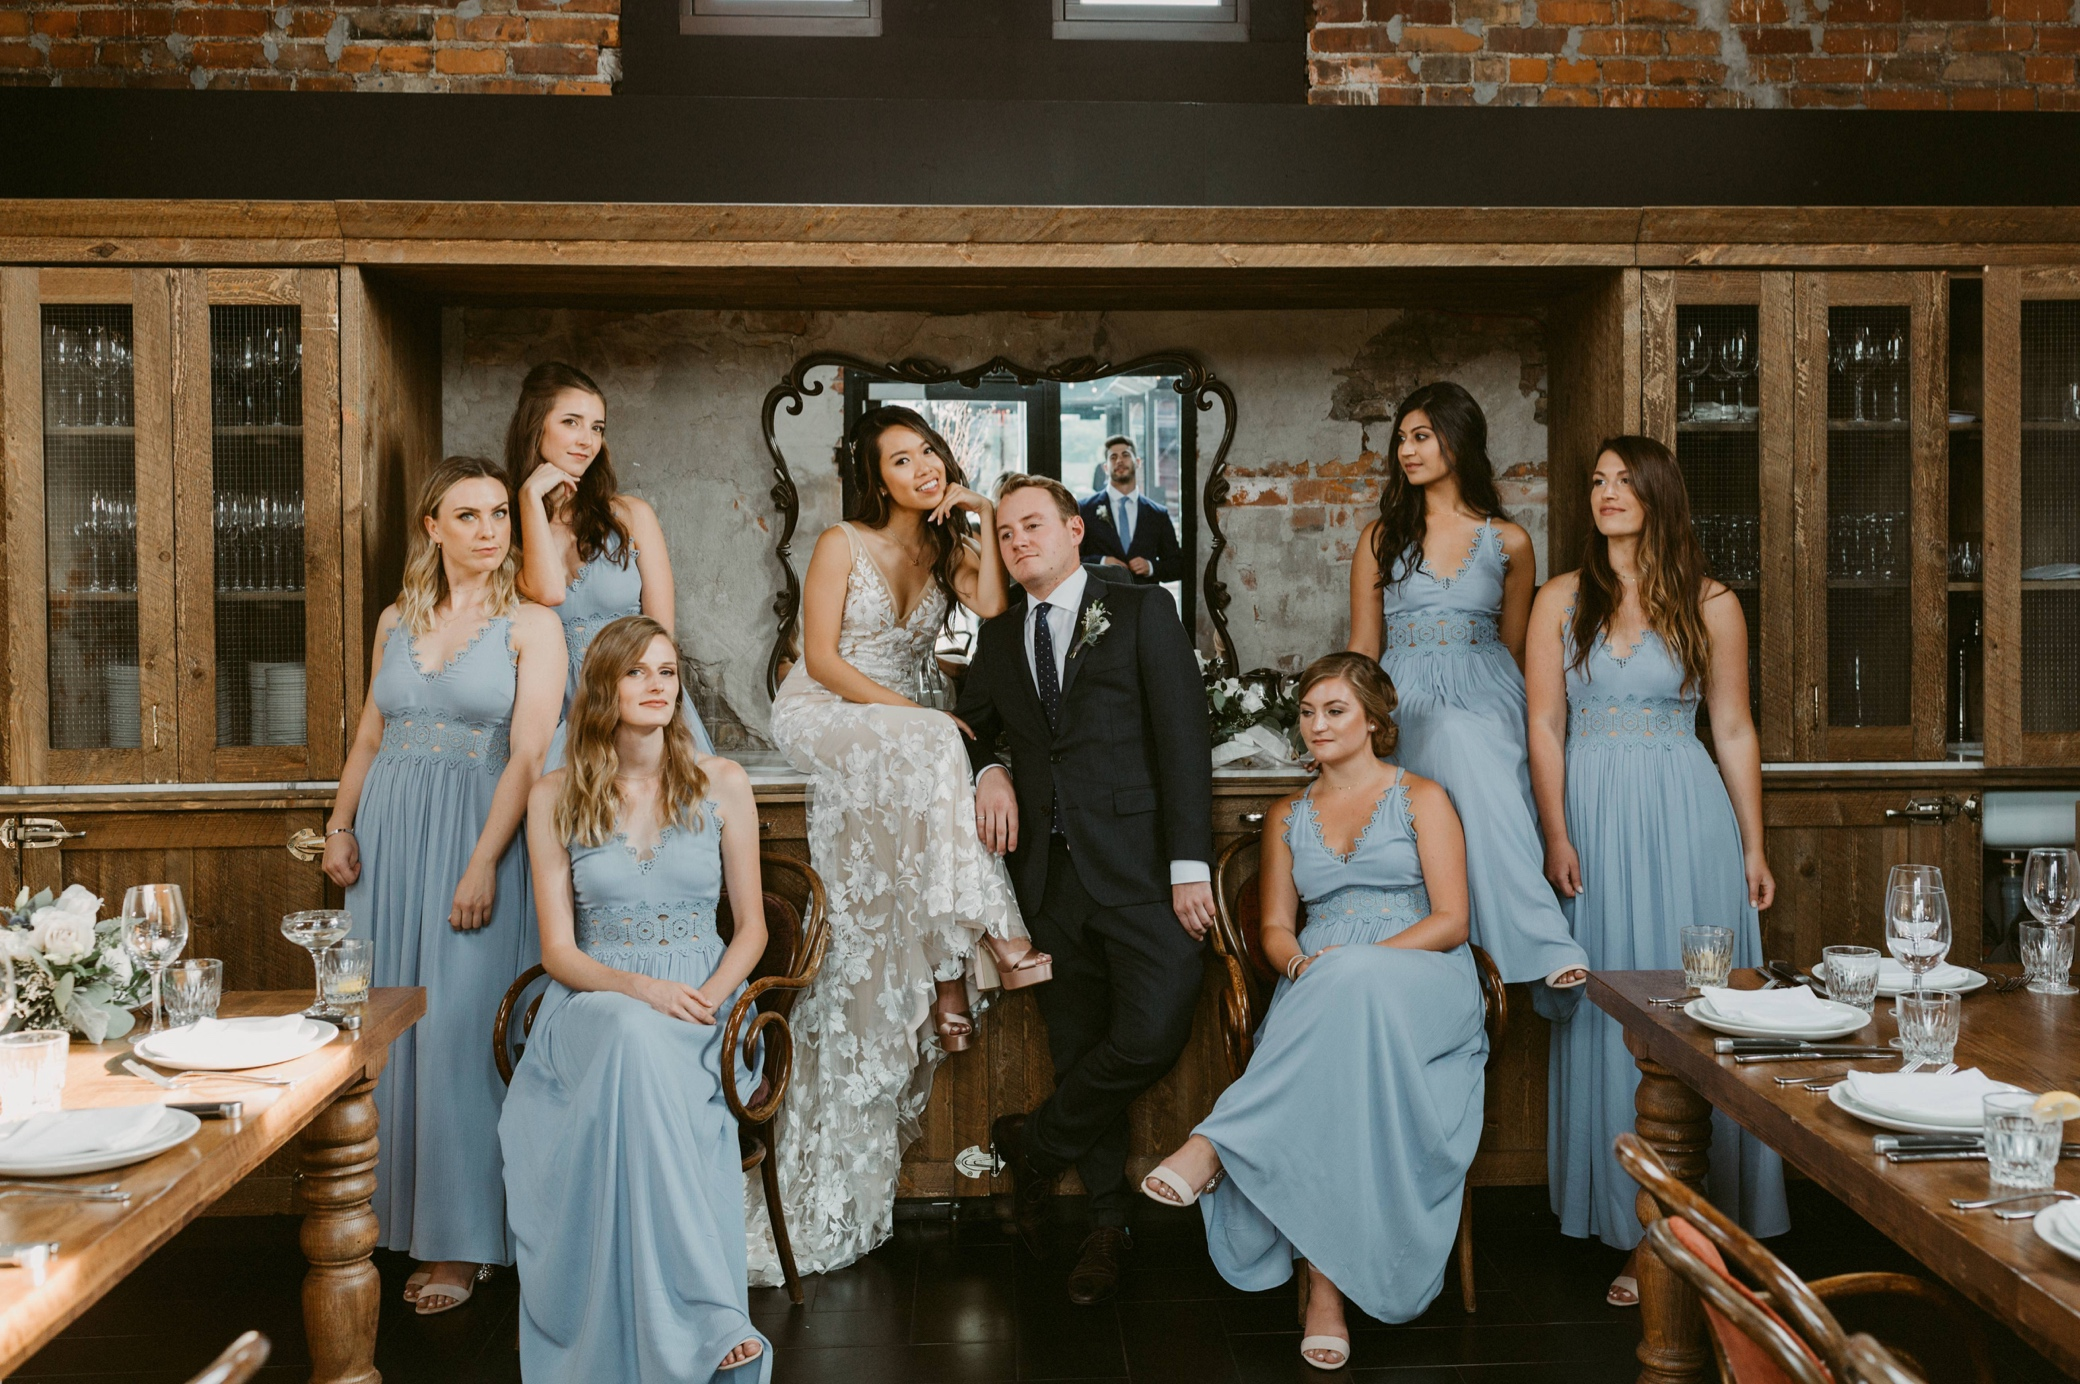 054_The Broadview Hotel Wedding (348 of 913)_Broadview_Hotel_City_Toronto_Wedding.jpg